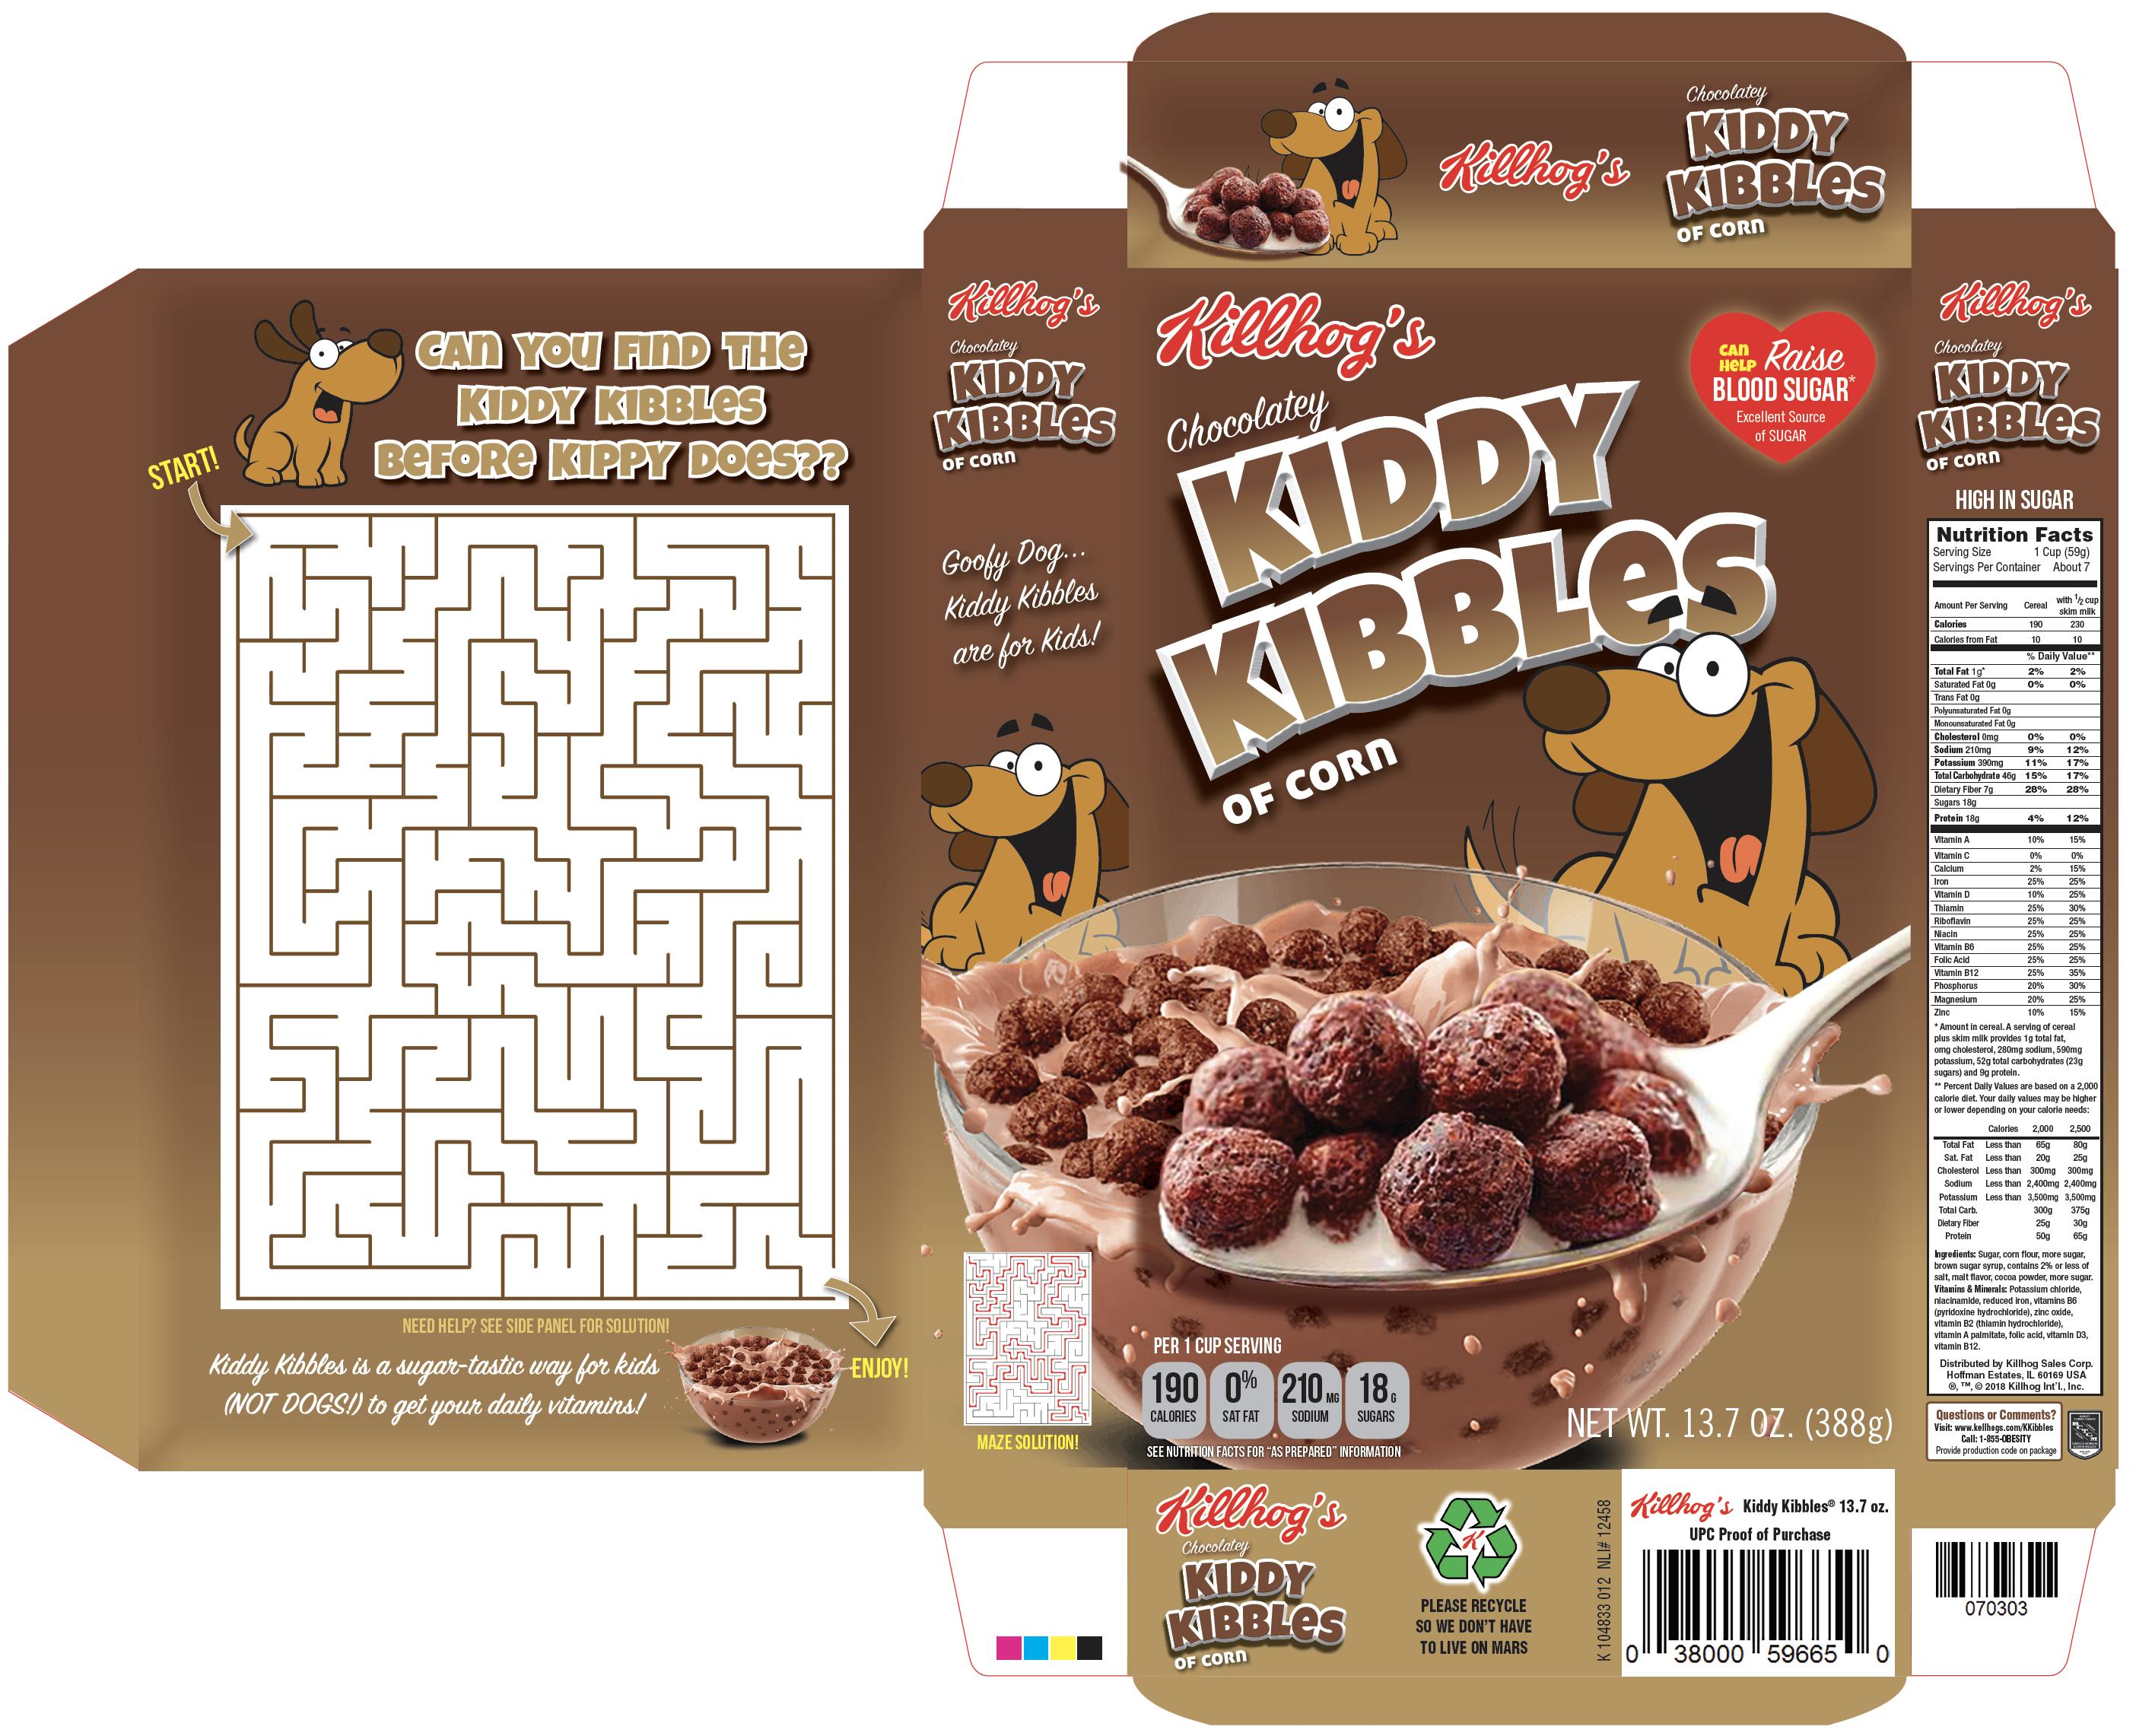 Kiddy Kibbles Box